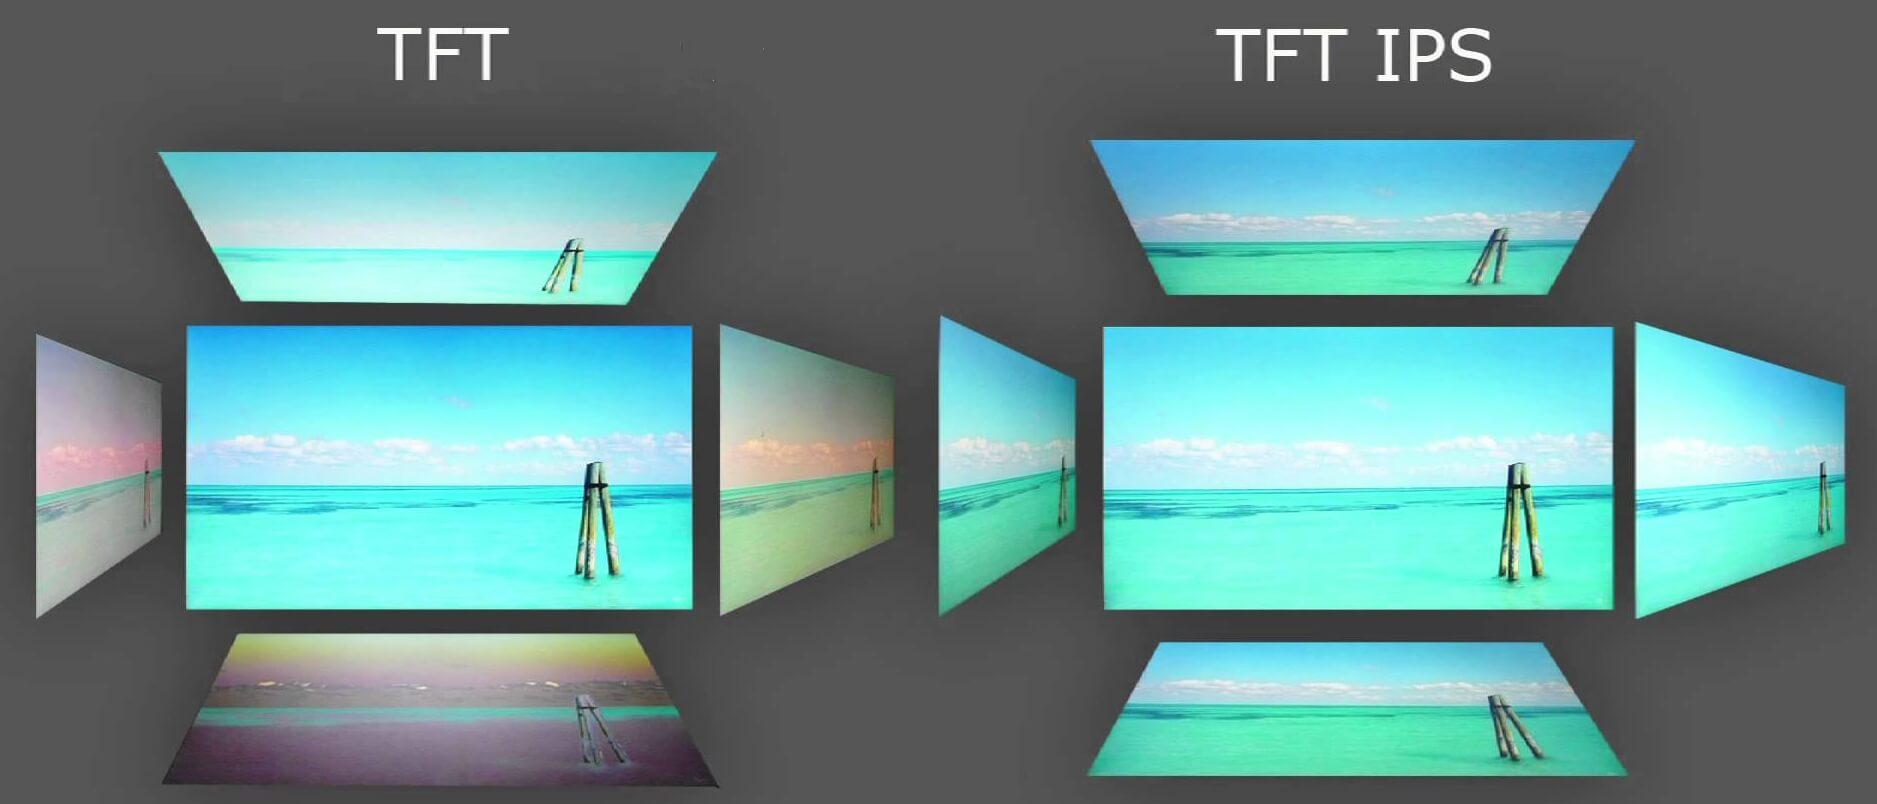 TFT vs TFT IPS